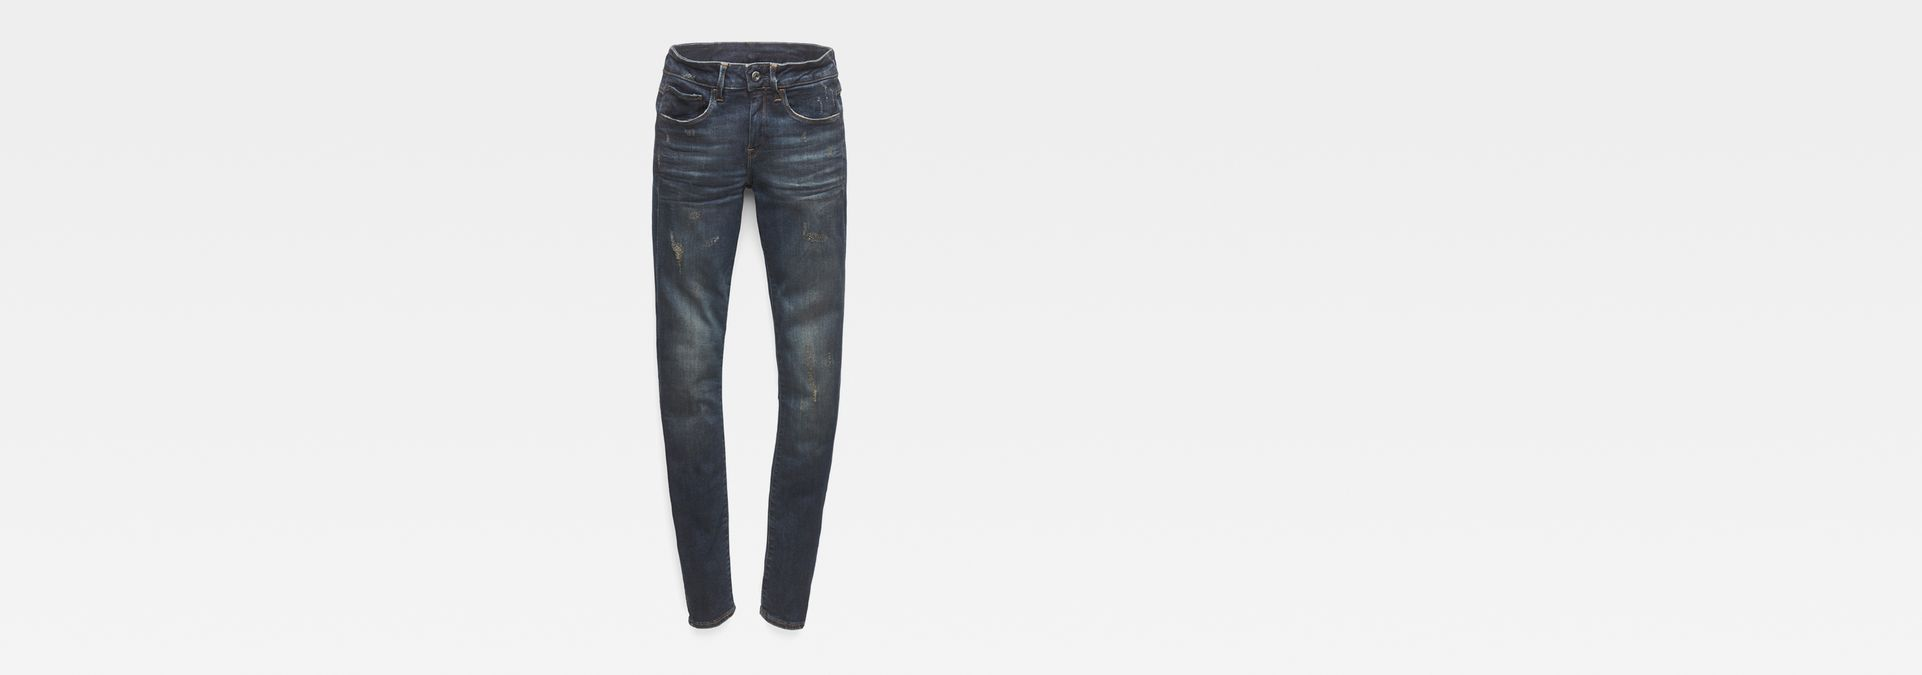 9ffc352106e1e6 ... G-Star RAW® 3301 Deconstucted Mid Waist Skinny Jeans Dark blue ...